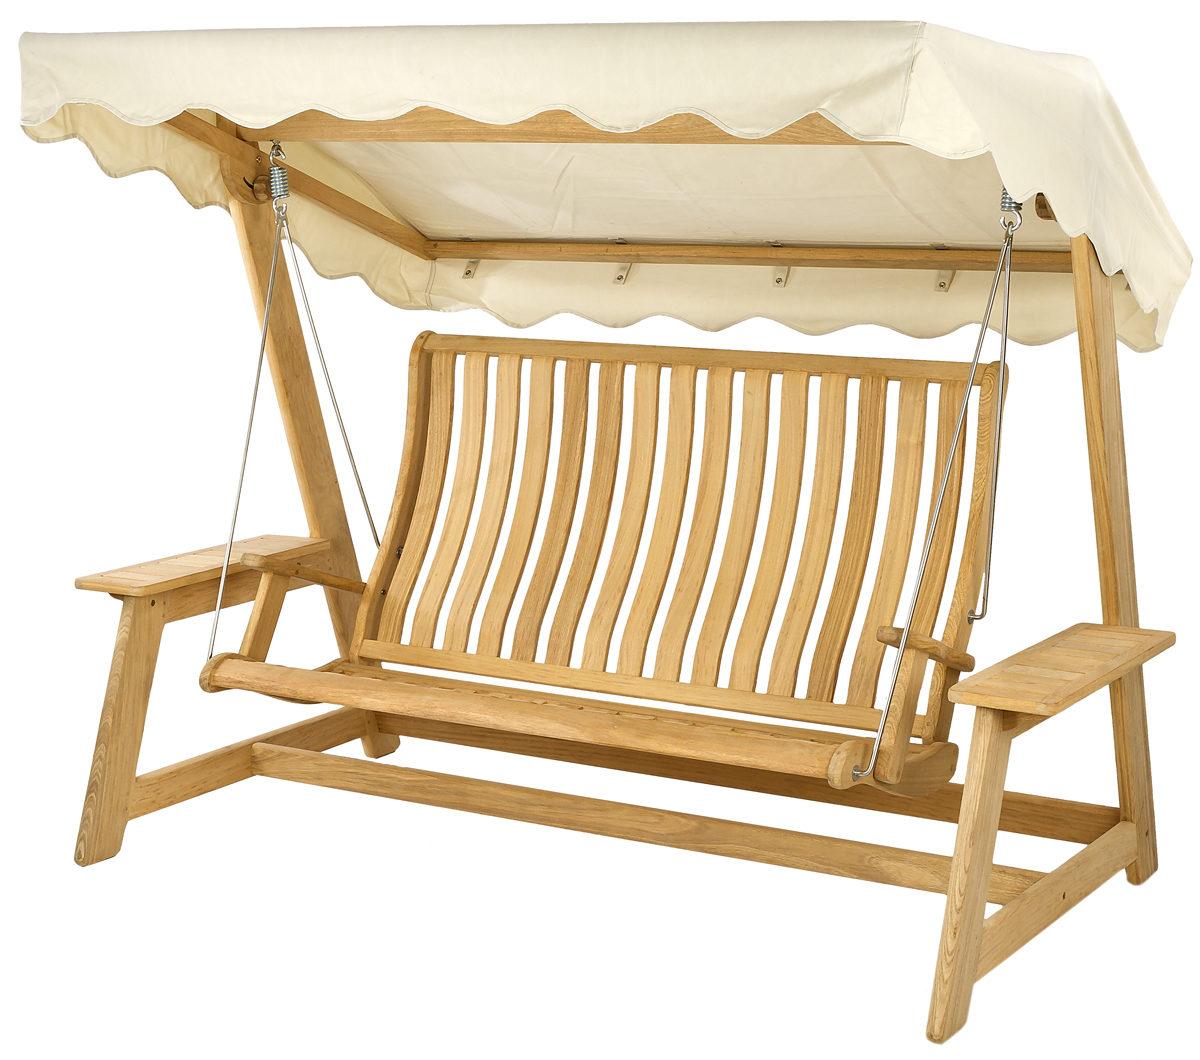 Alexander Rose Roble Swing Seat - 193